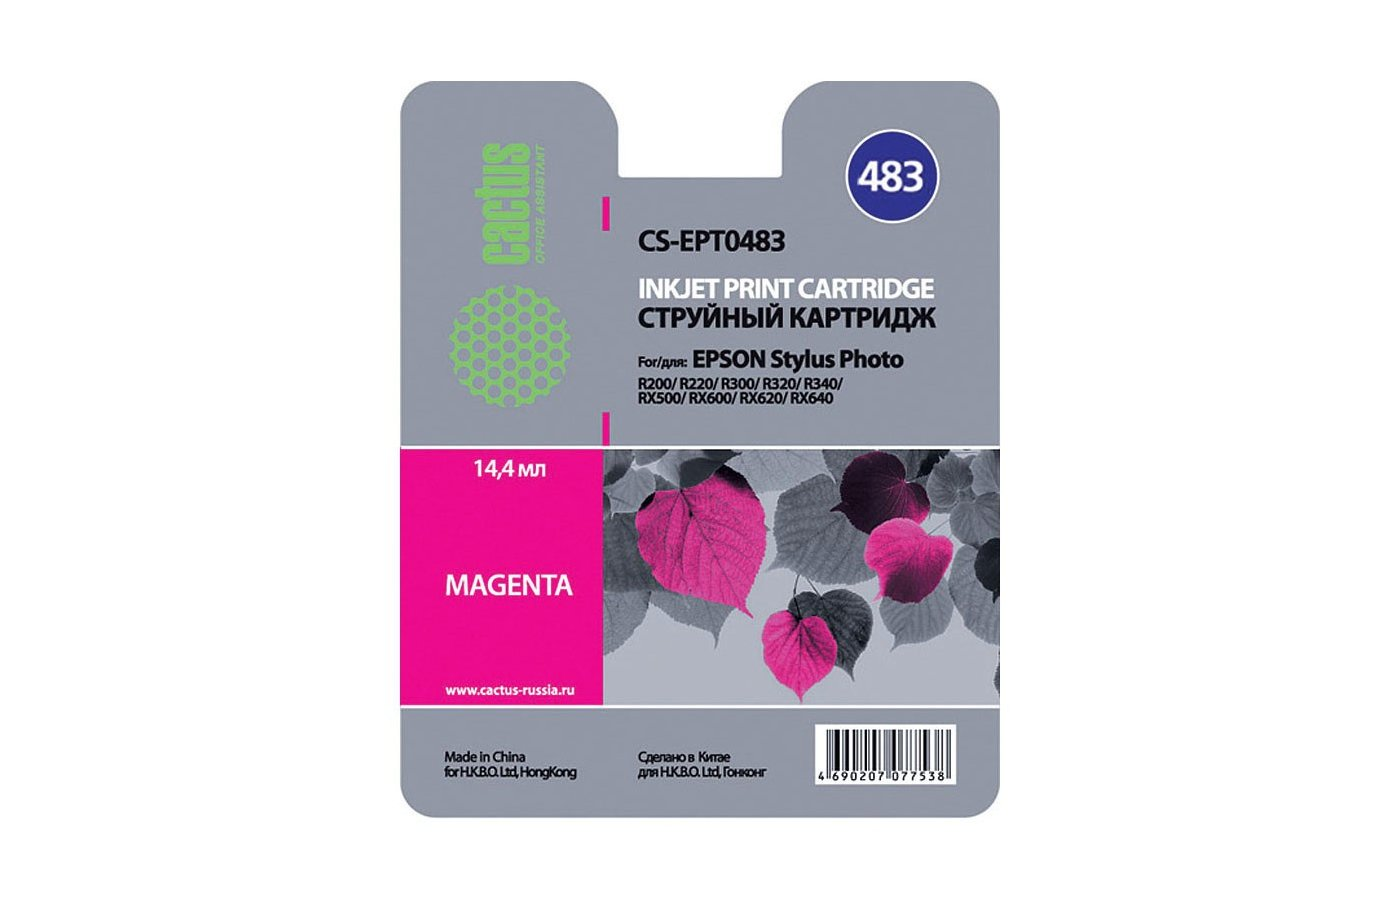 Картридж струйный Cactus CS-EPT0483 совместимый пурпурный для Epson Stylus Photo R200/ R220/ R300 (14,4ml)